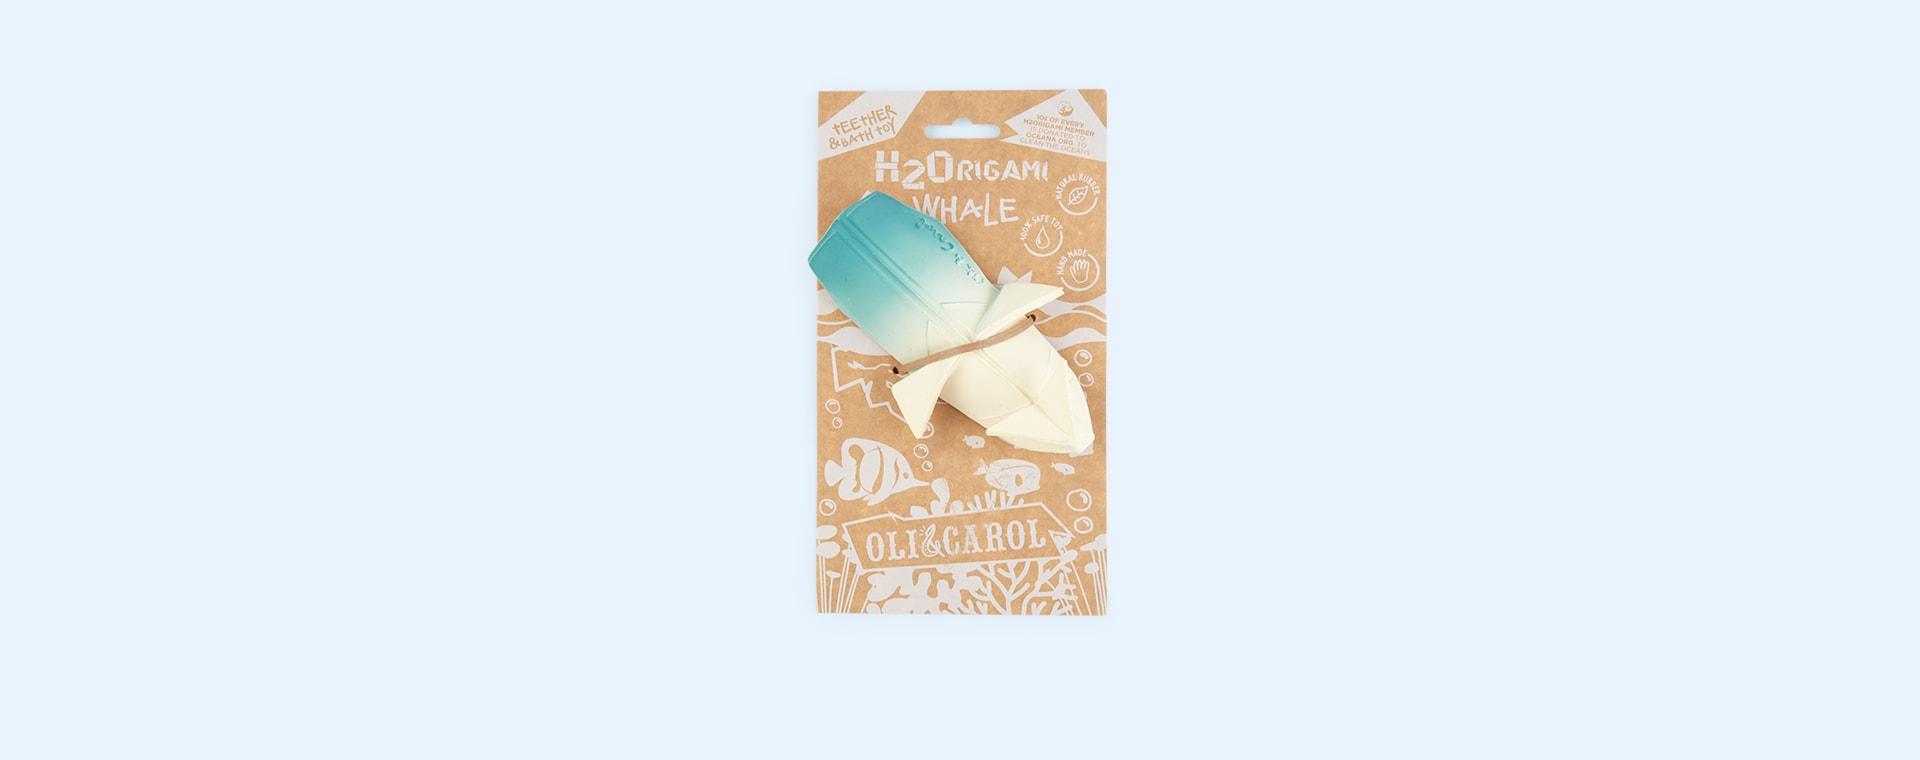 Blue Oli & Carol H2Origami Whale